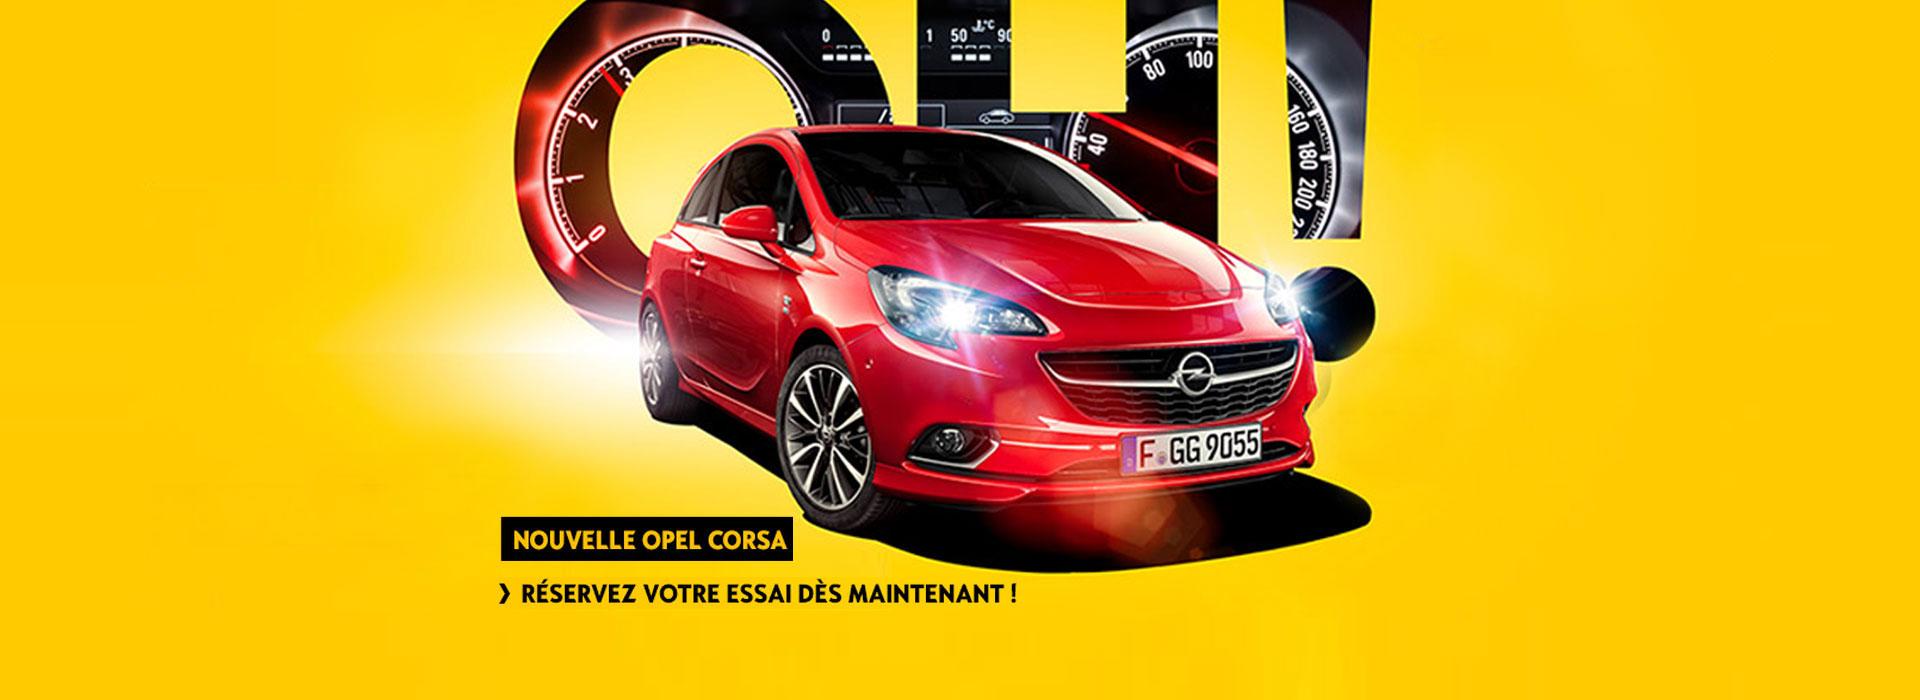 Opel Nouvelle Corsa 5 portes